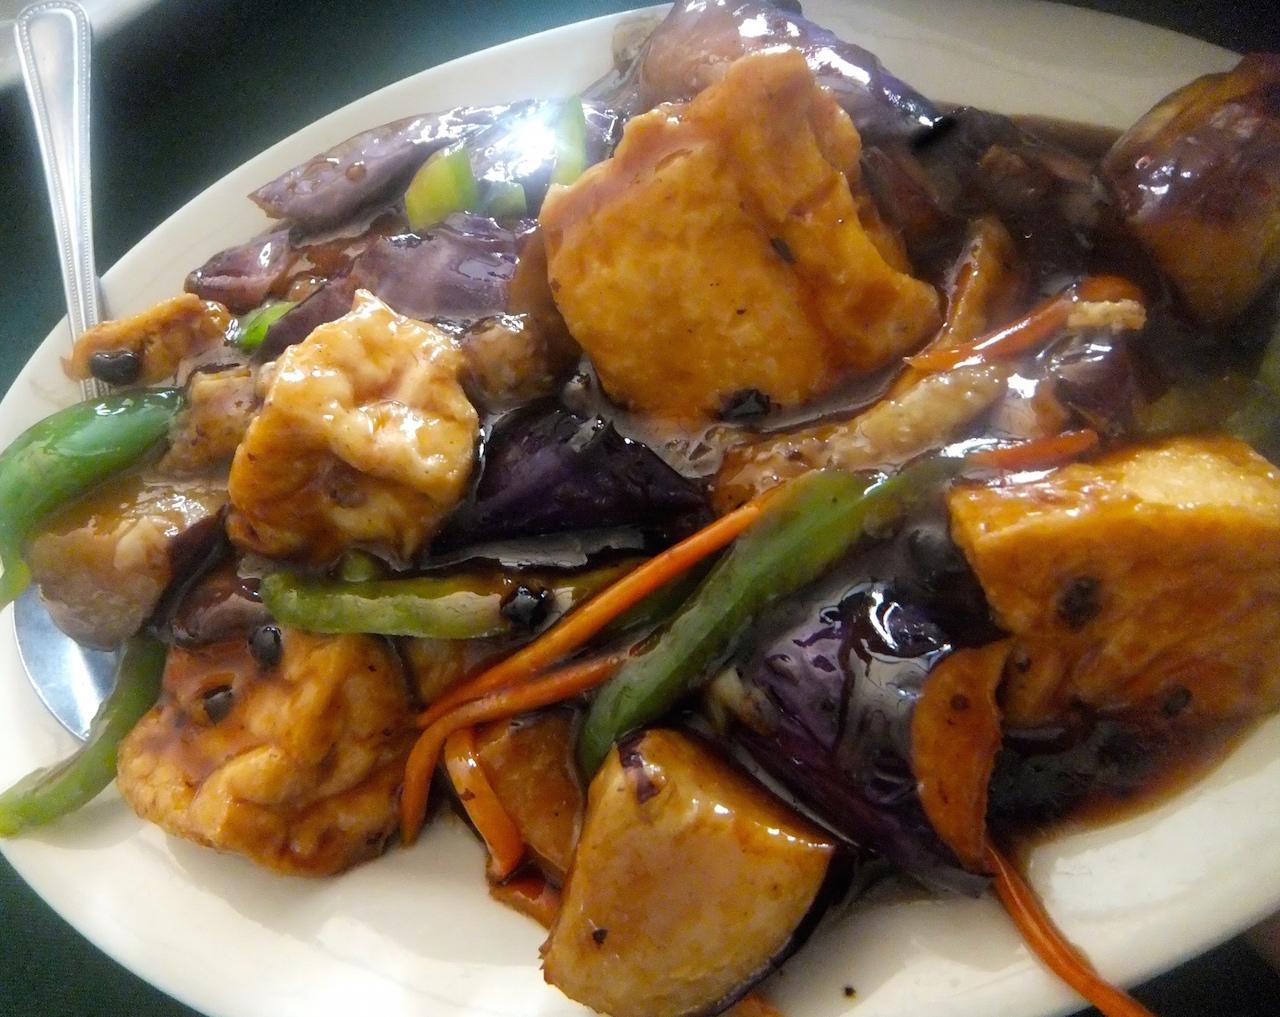 https://www.facebook.com/New-Harmony-Vegetarian-Restaurant-192359379755/